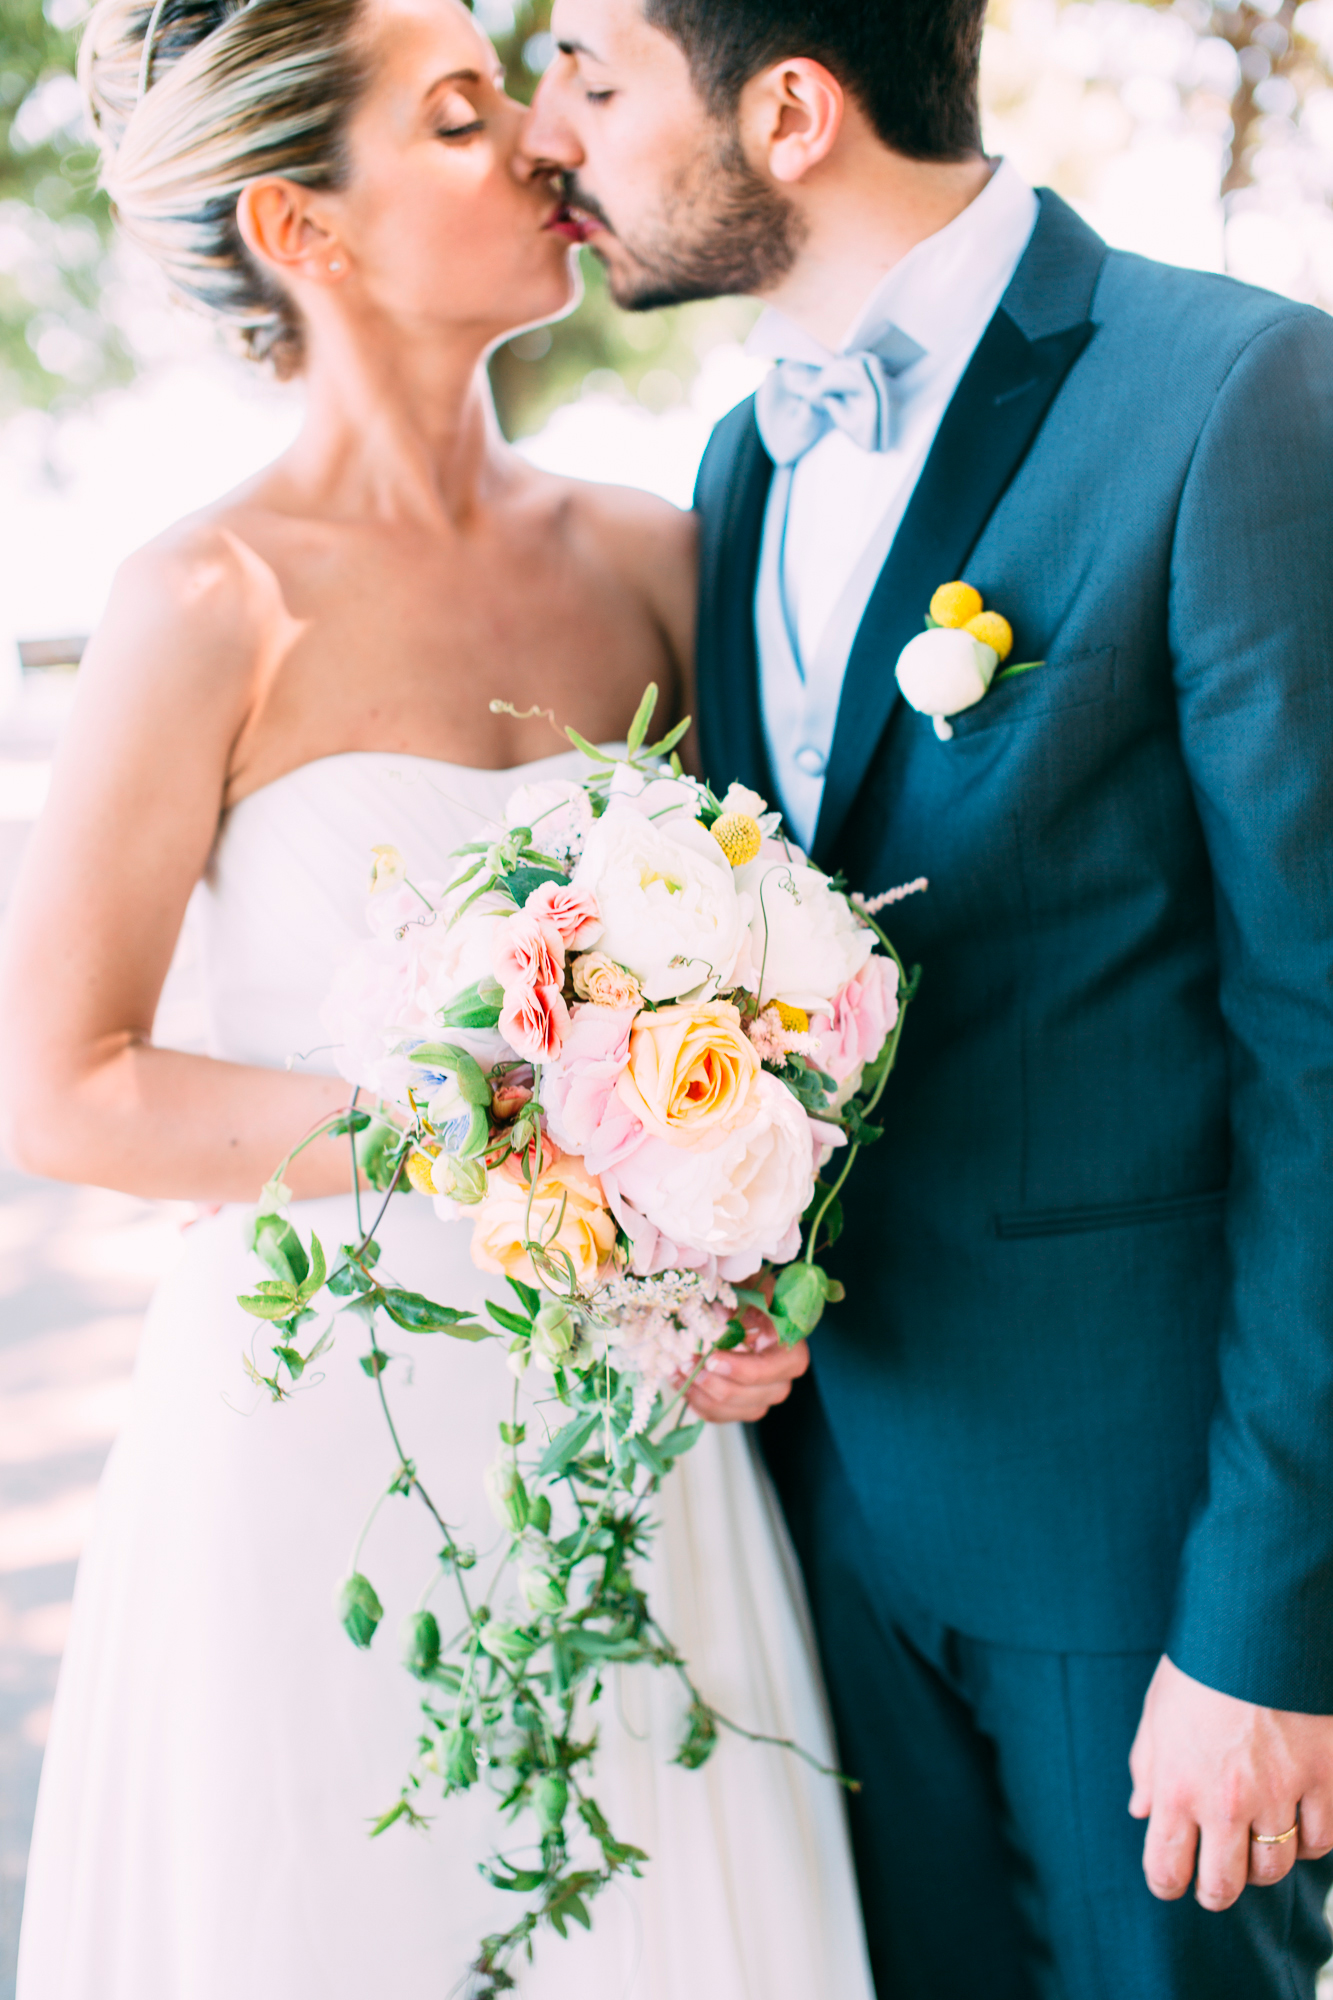 156-bride groom wedding portrait photographer marche conero.jpg